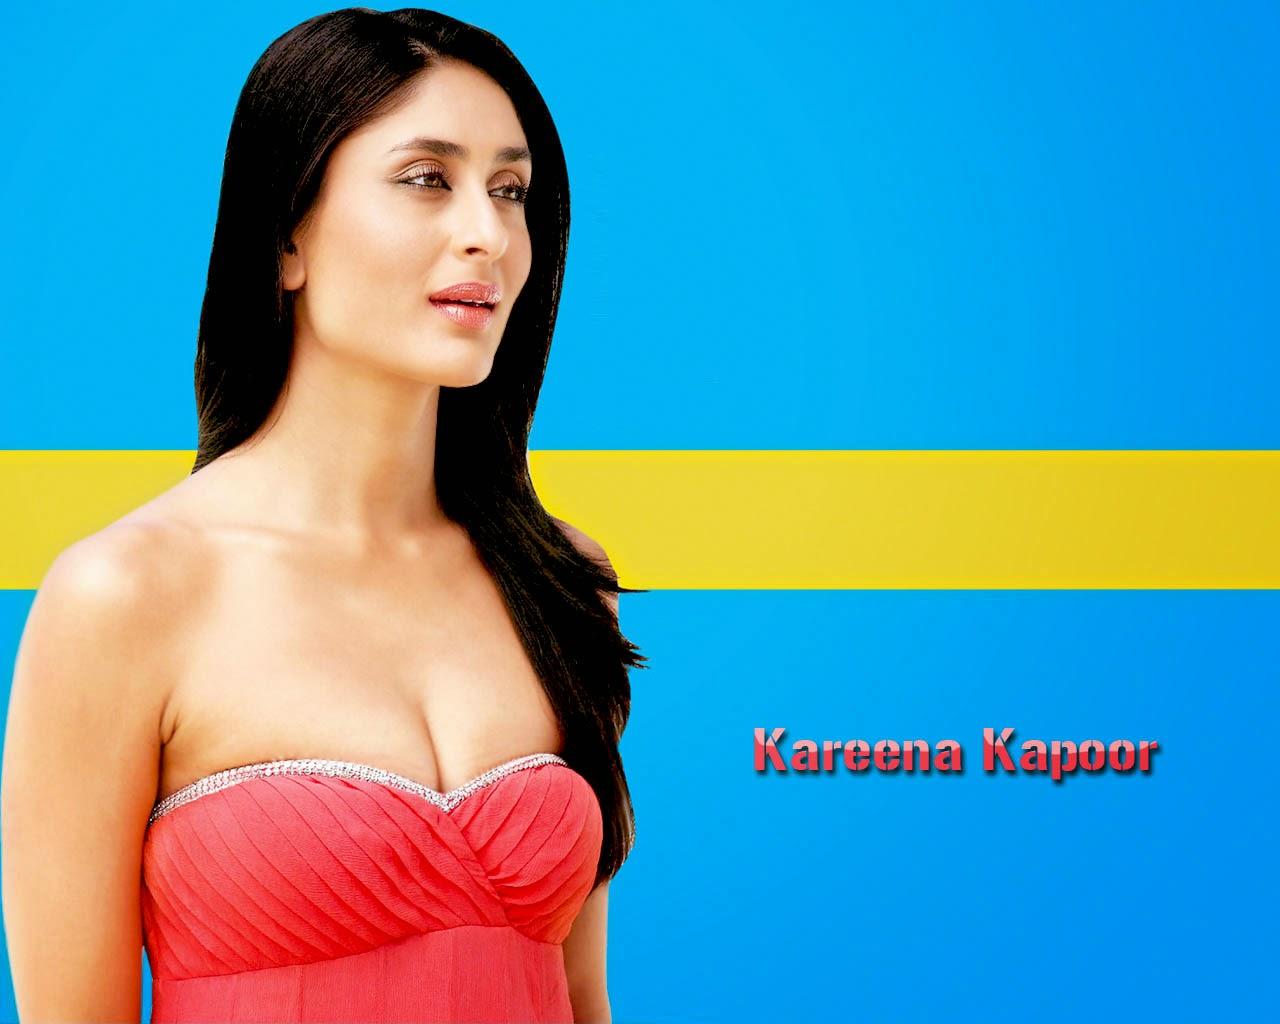 bollywood actress karenna kapoor full hd wallpaper hot photos, full